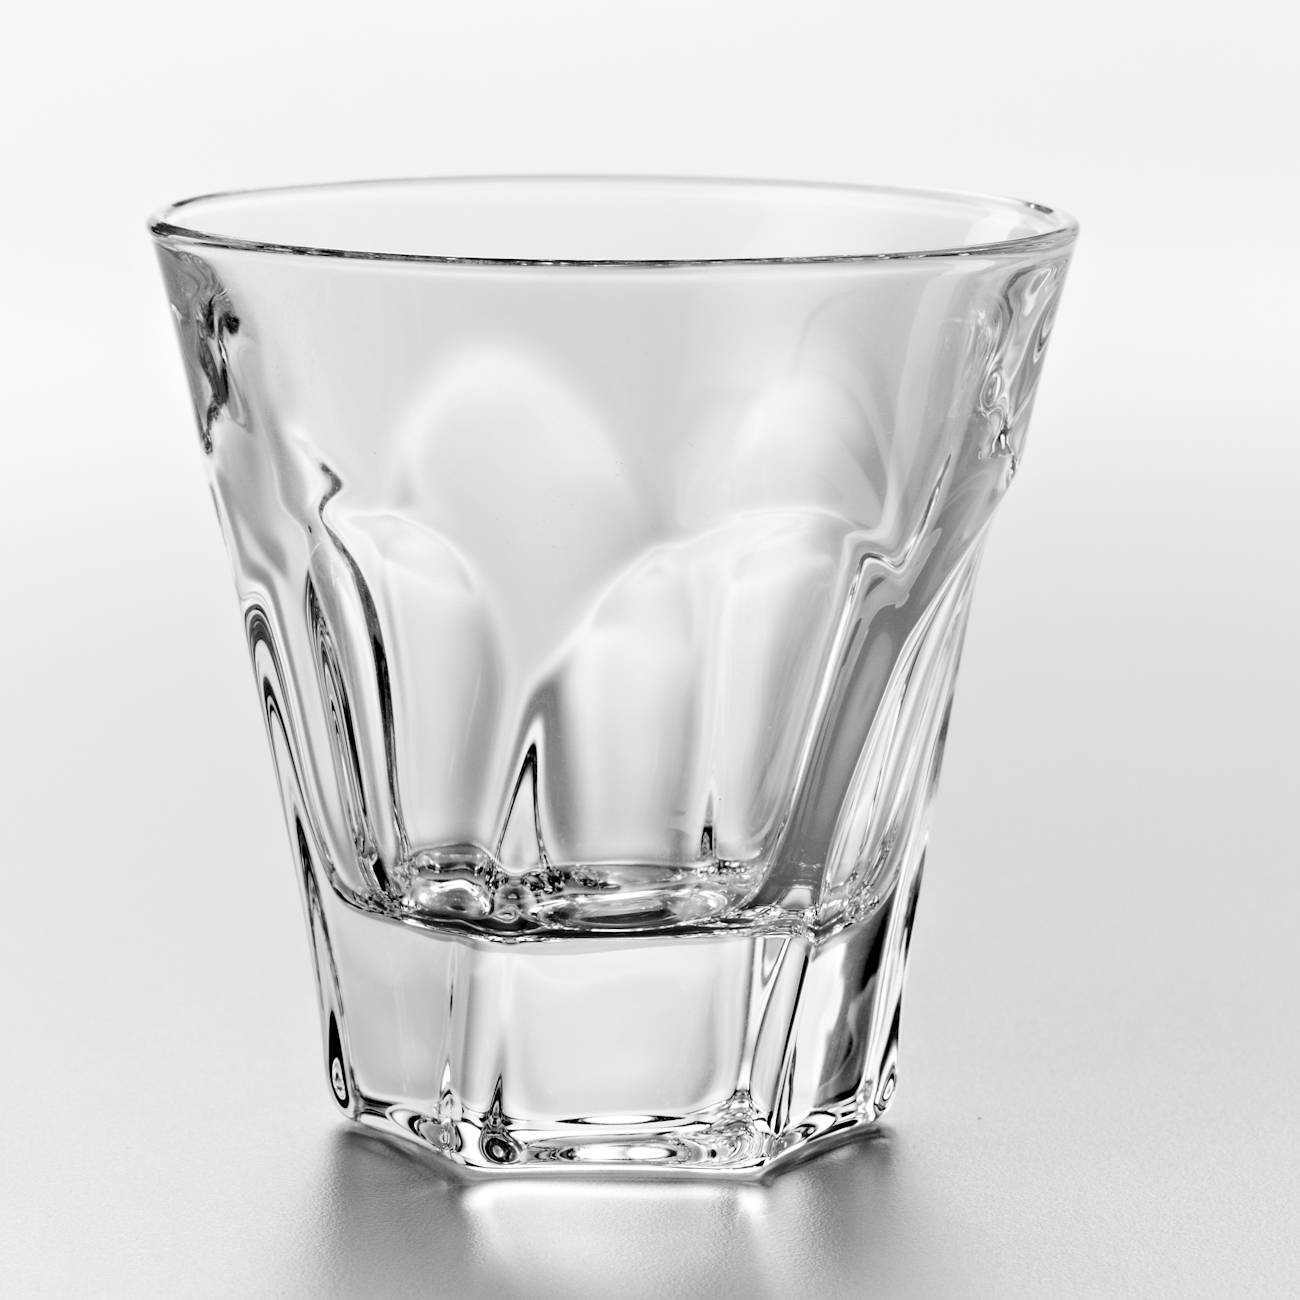 Conjunto 6 Copos para Whisky Apollo - 230 ml - em Cristal